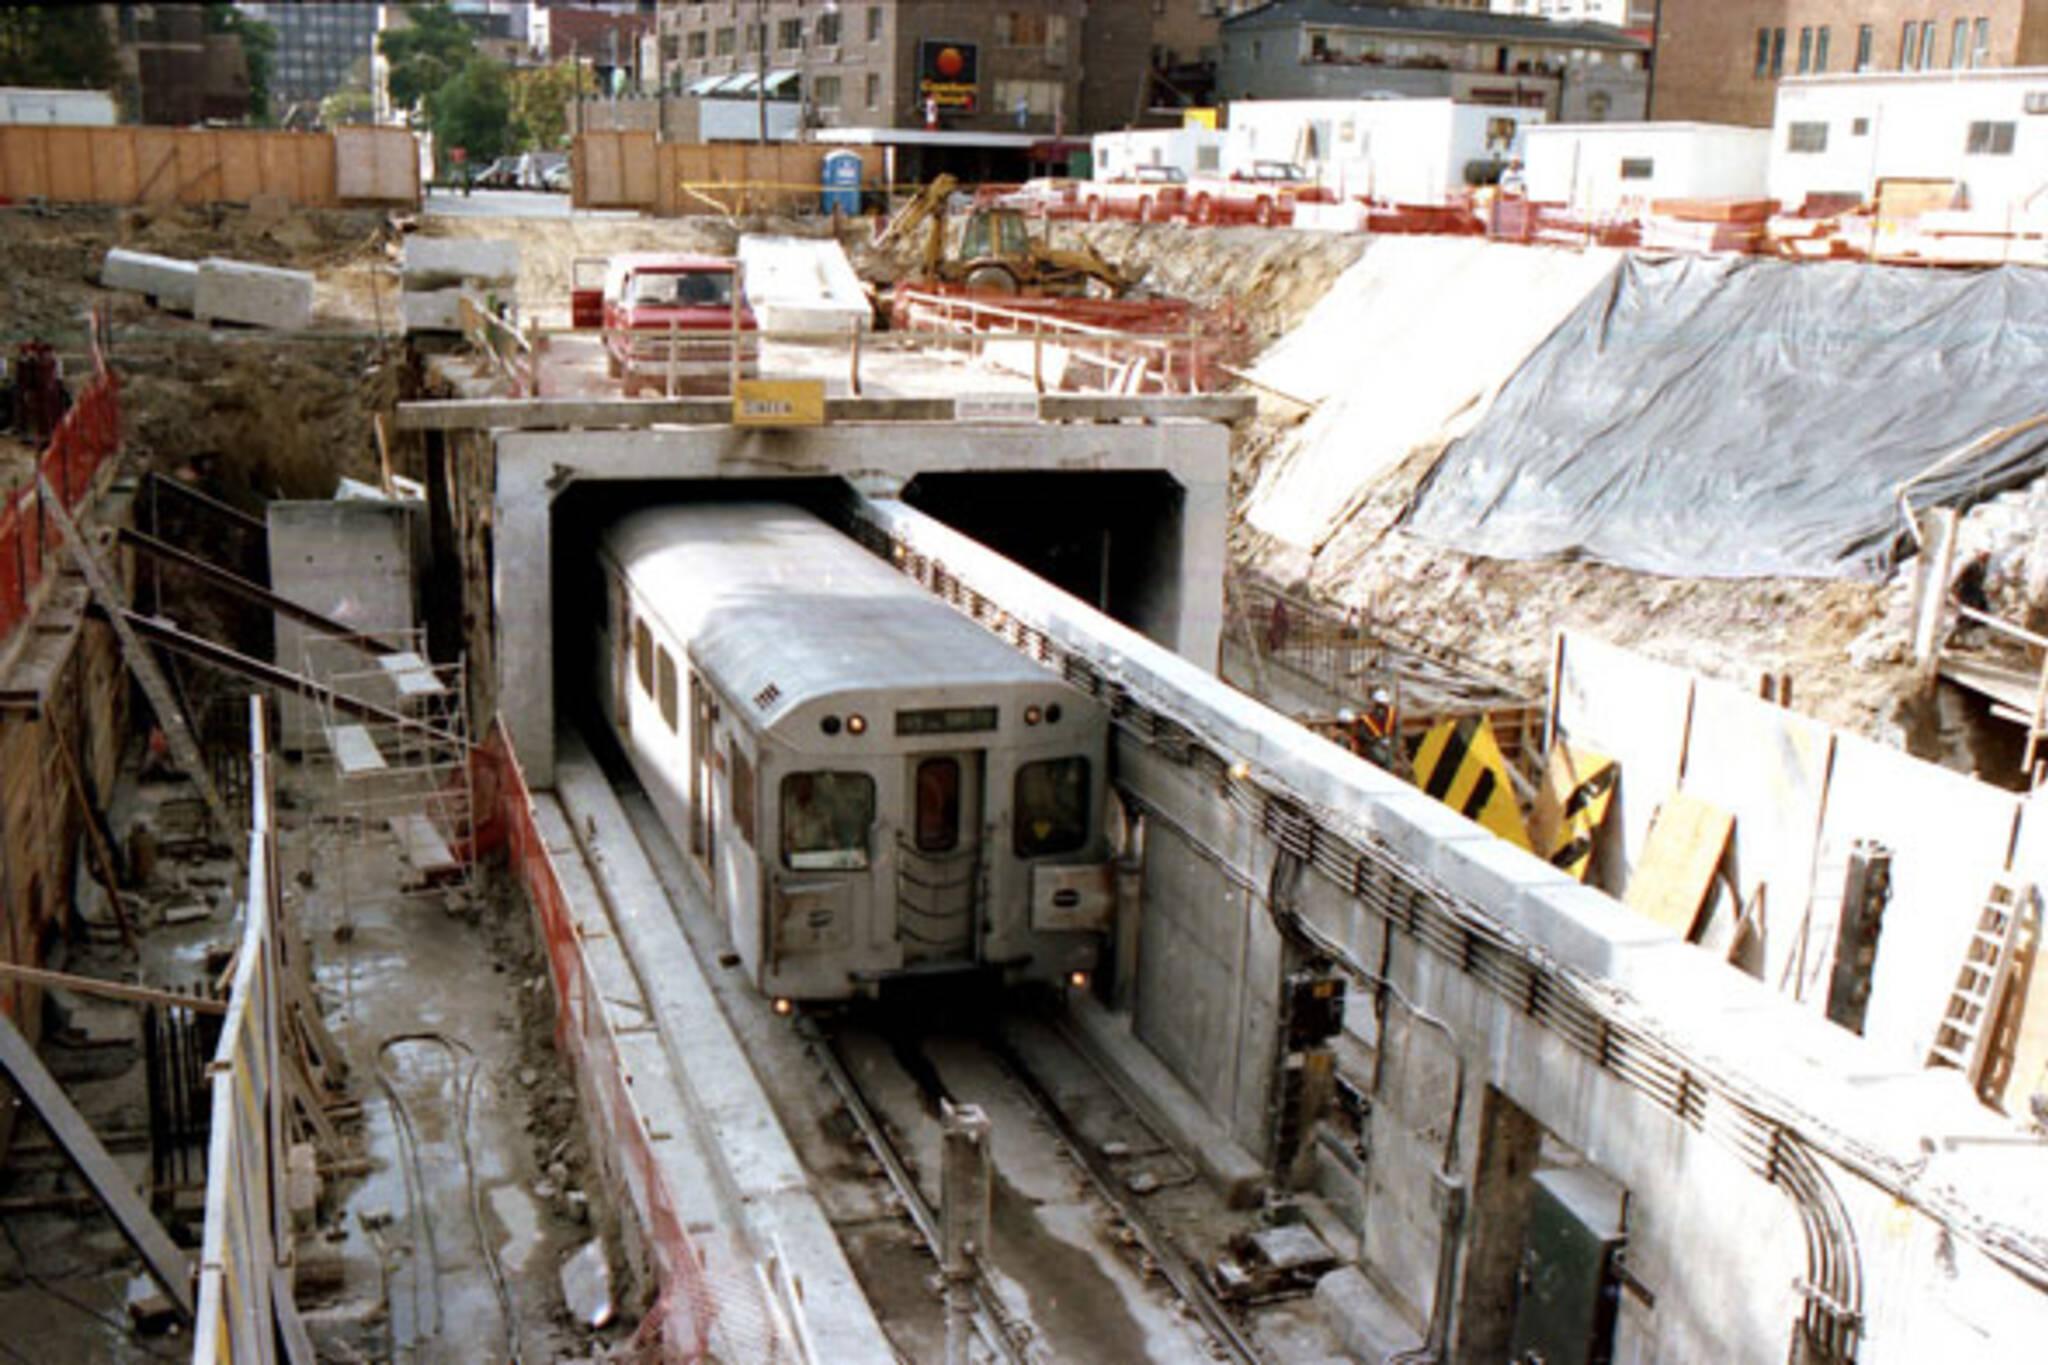 toronto bloor station construction